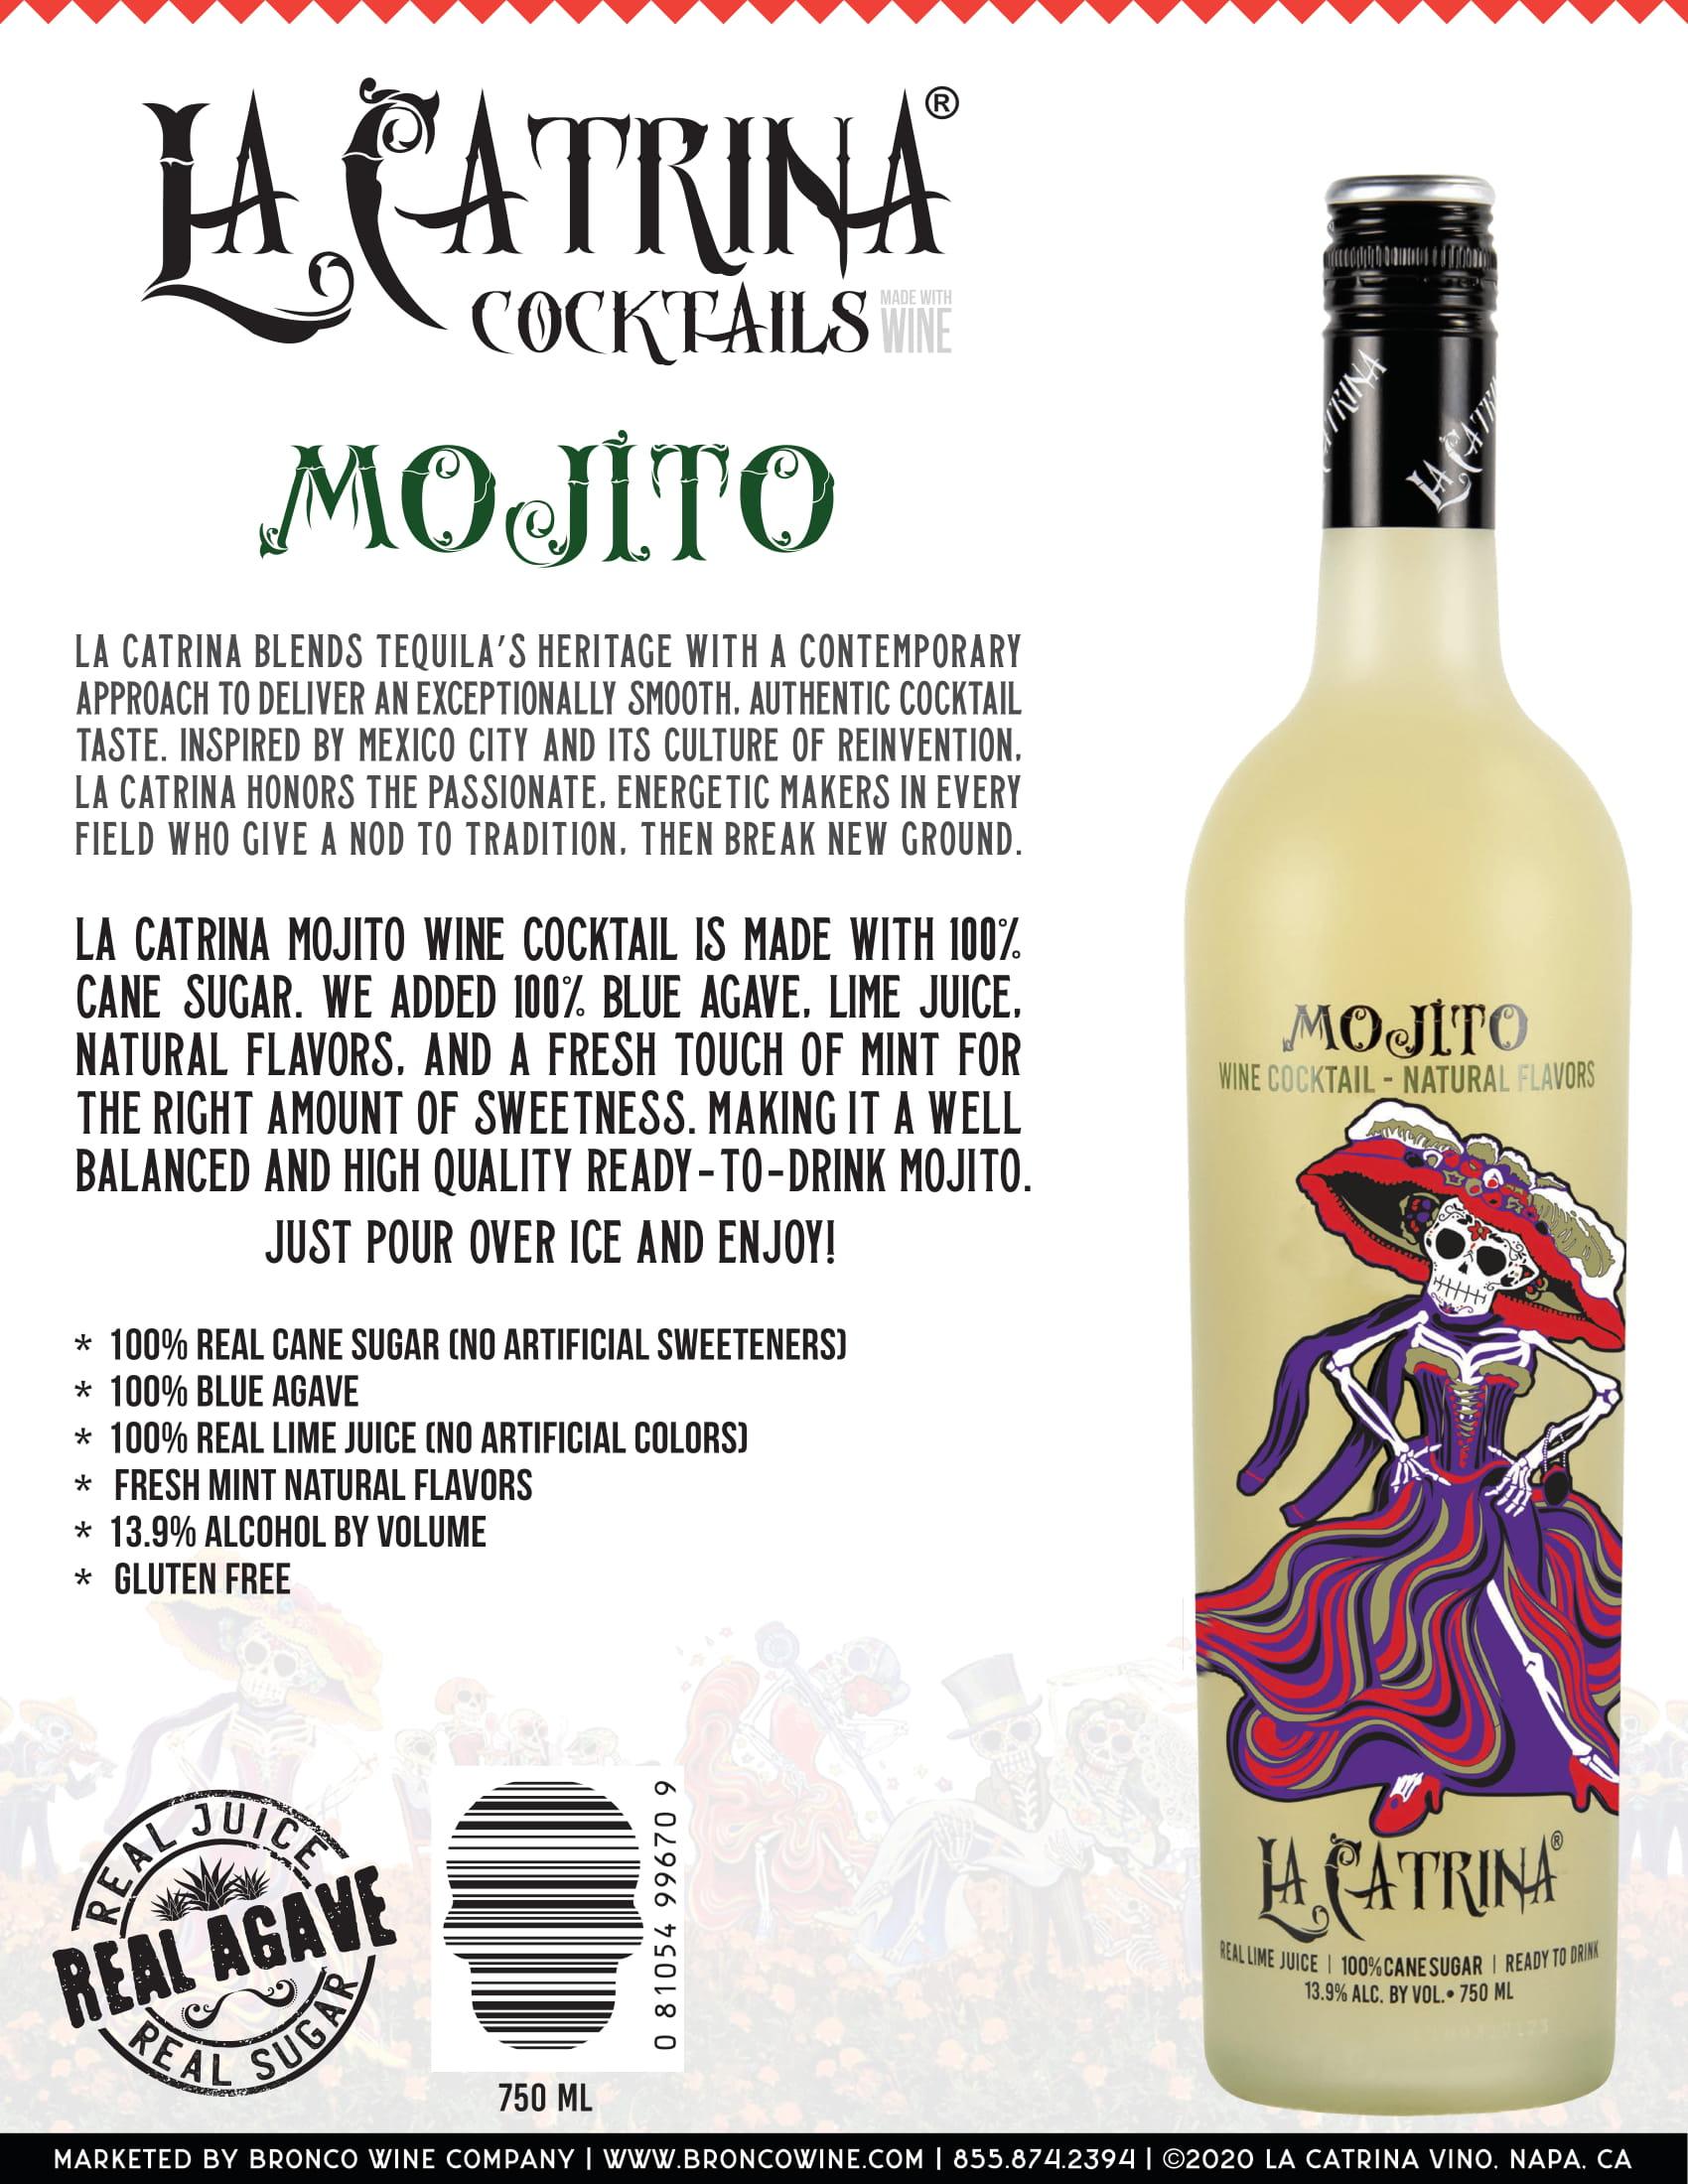 La Catrina Cocktails Mojito Tech Sheet